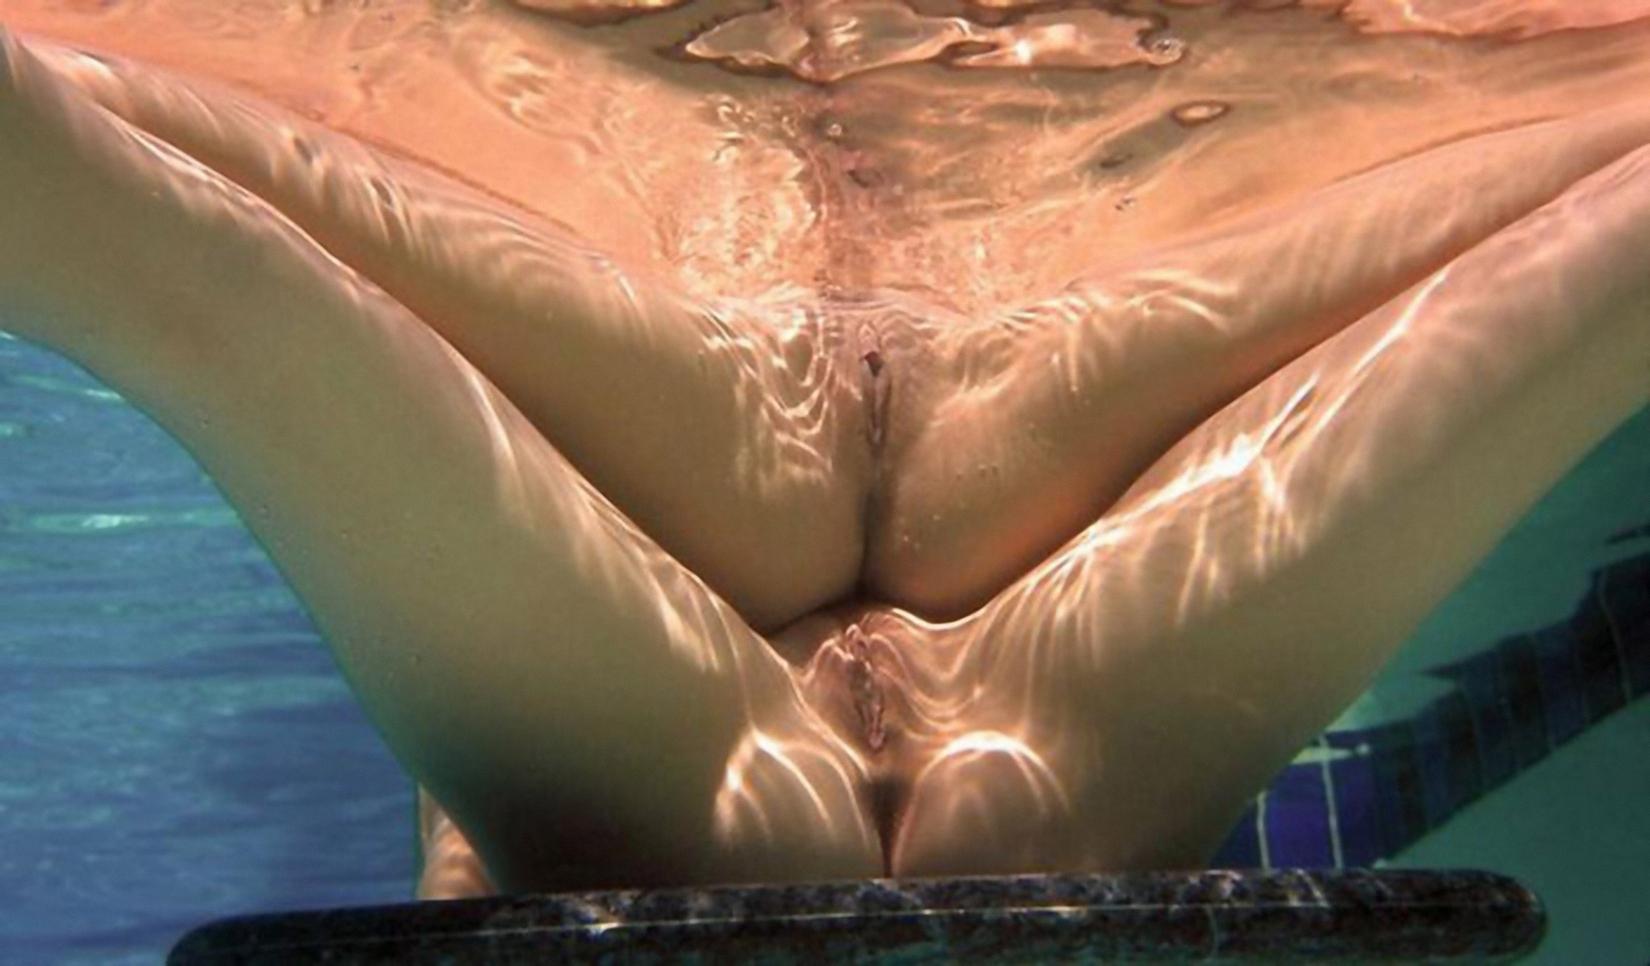 swimmer-creampie-galleries-men-fucking-women